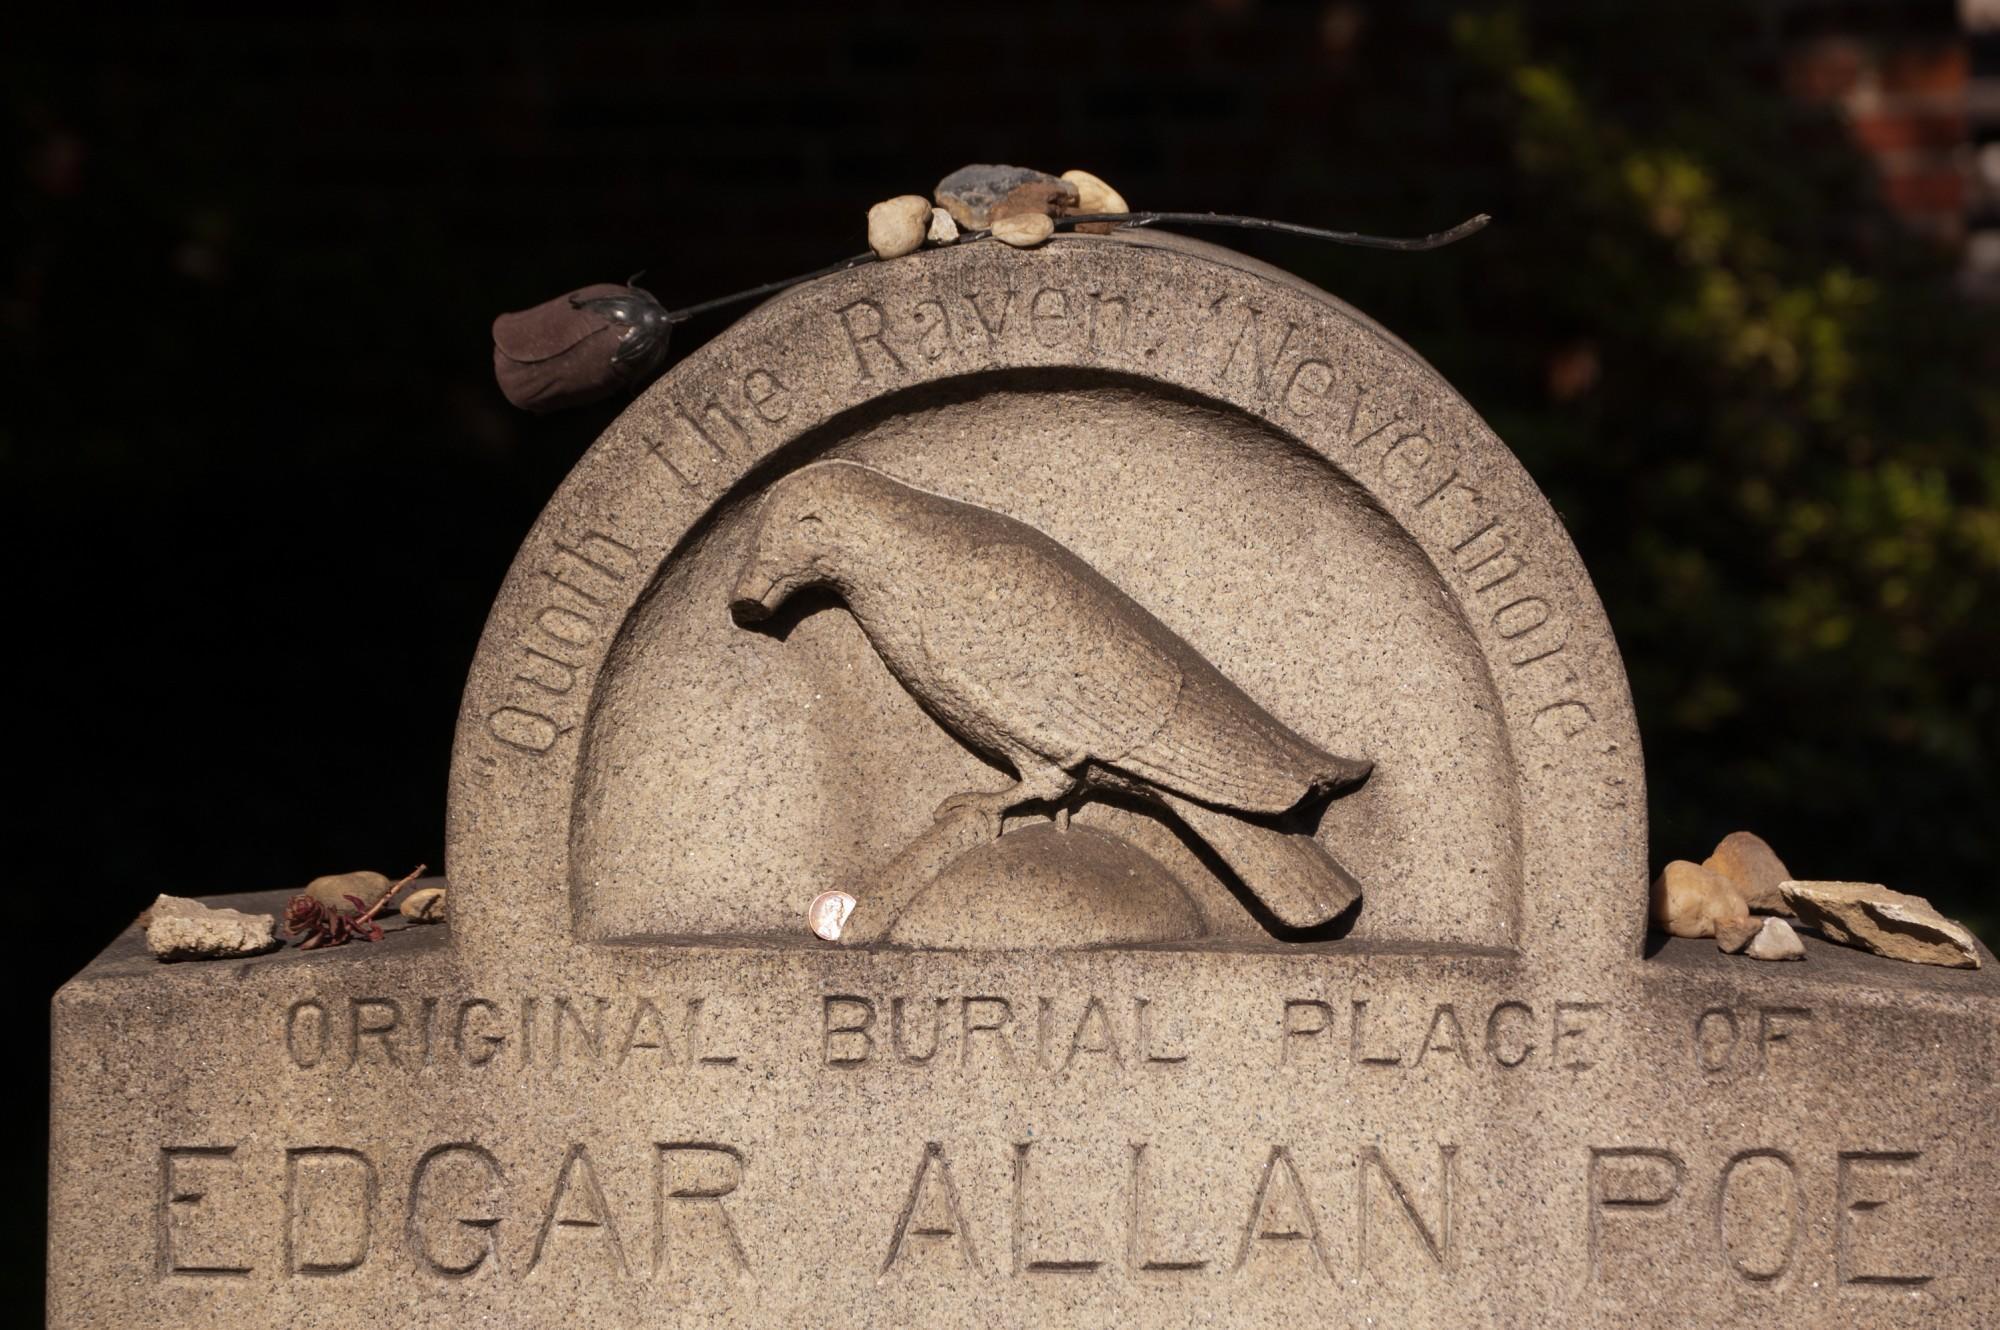 Edgar Allan Poe's Original Grave